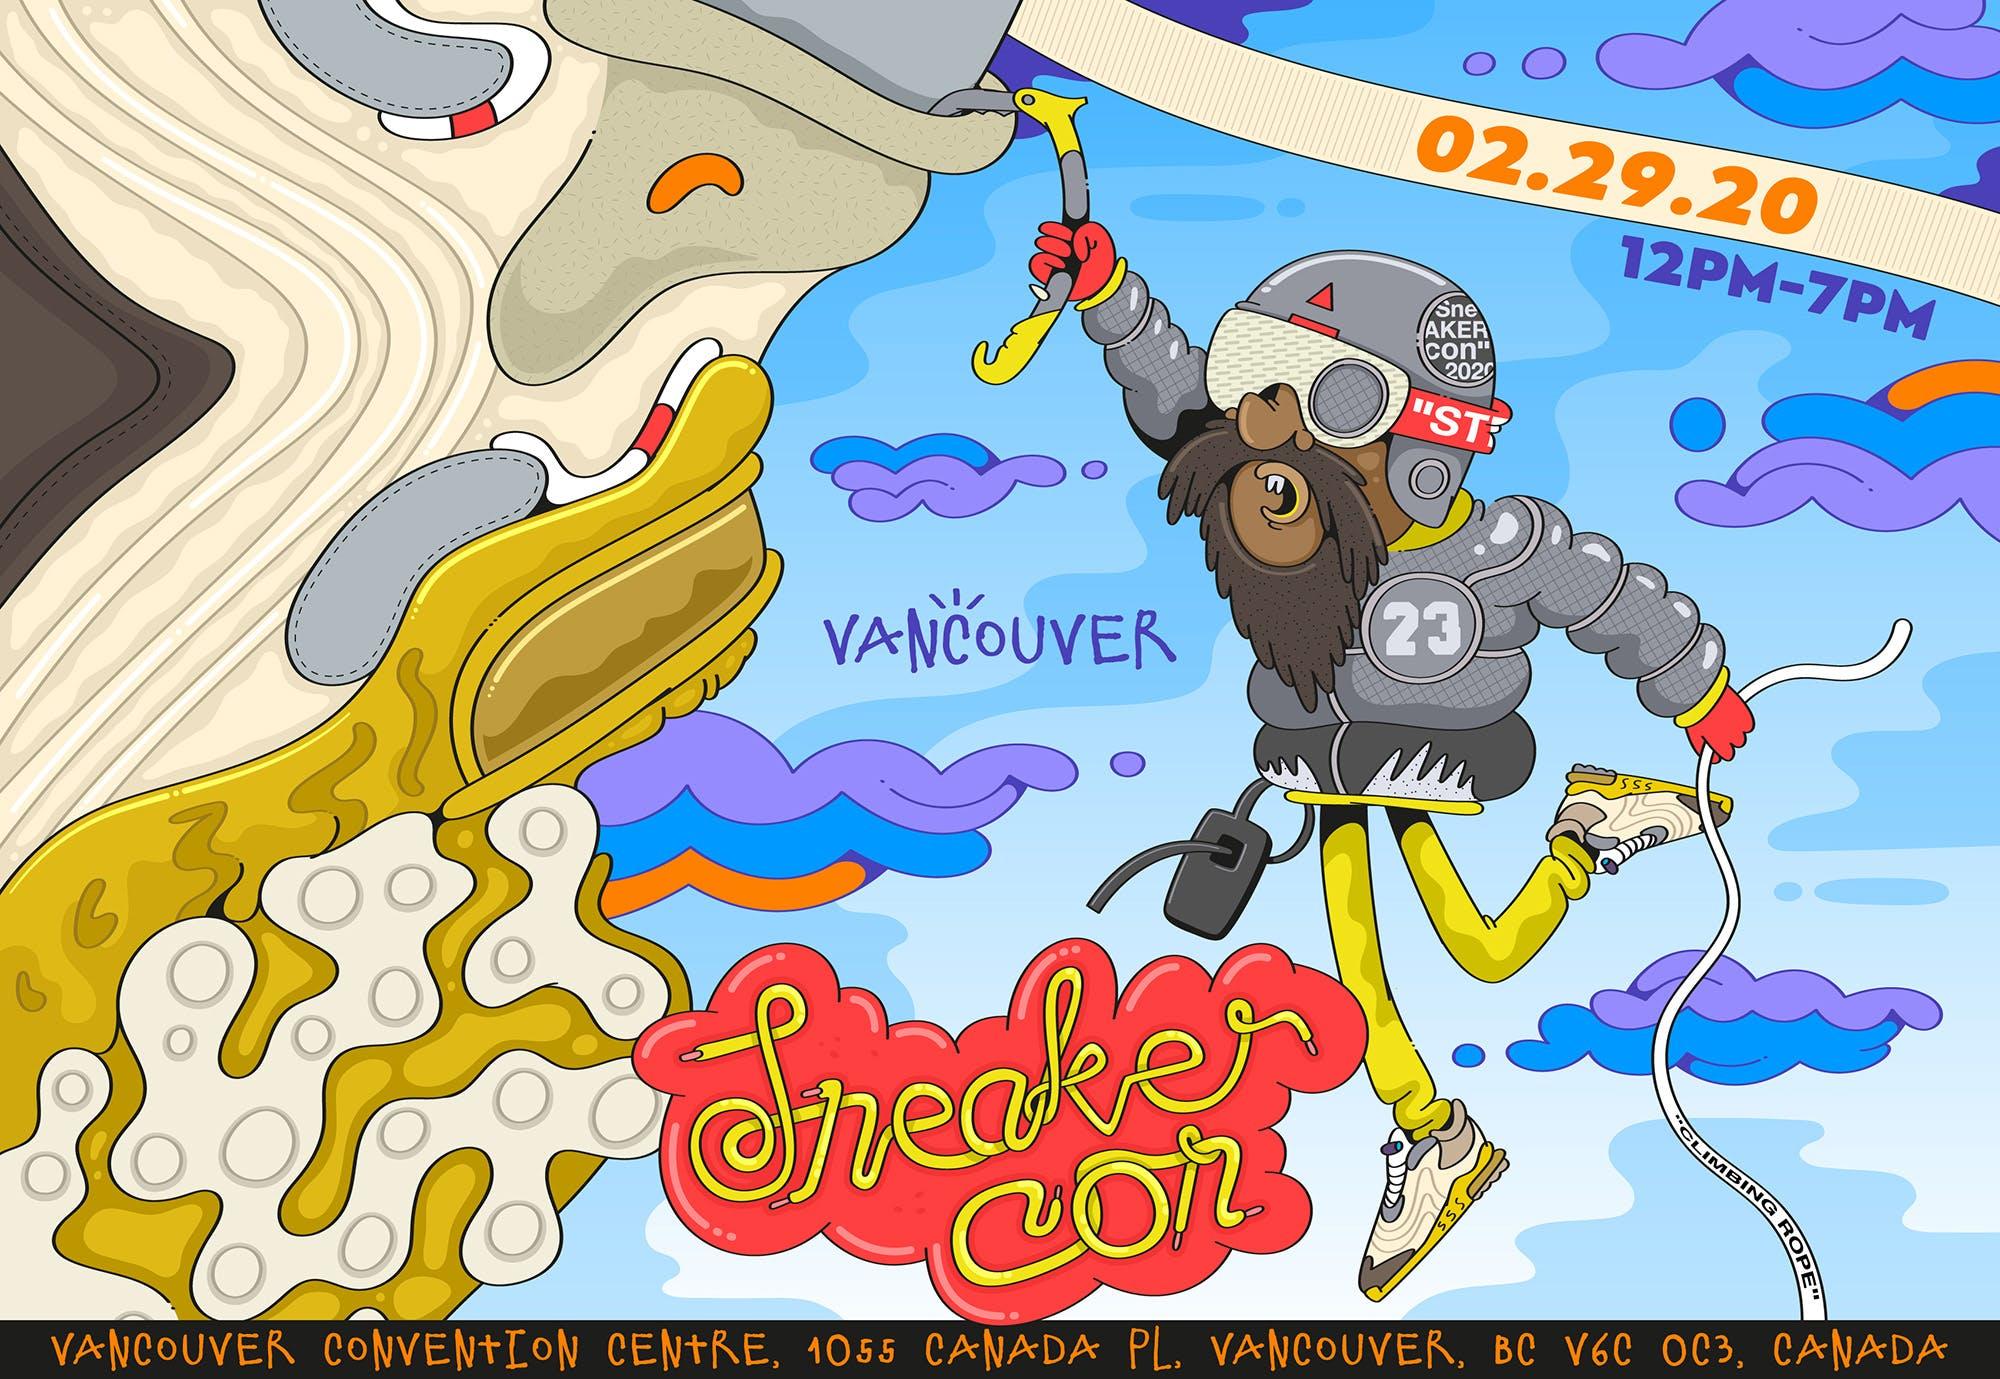 Sneaker Con Vancouver